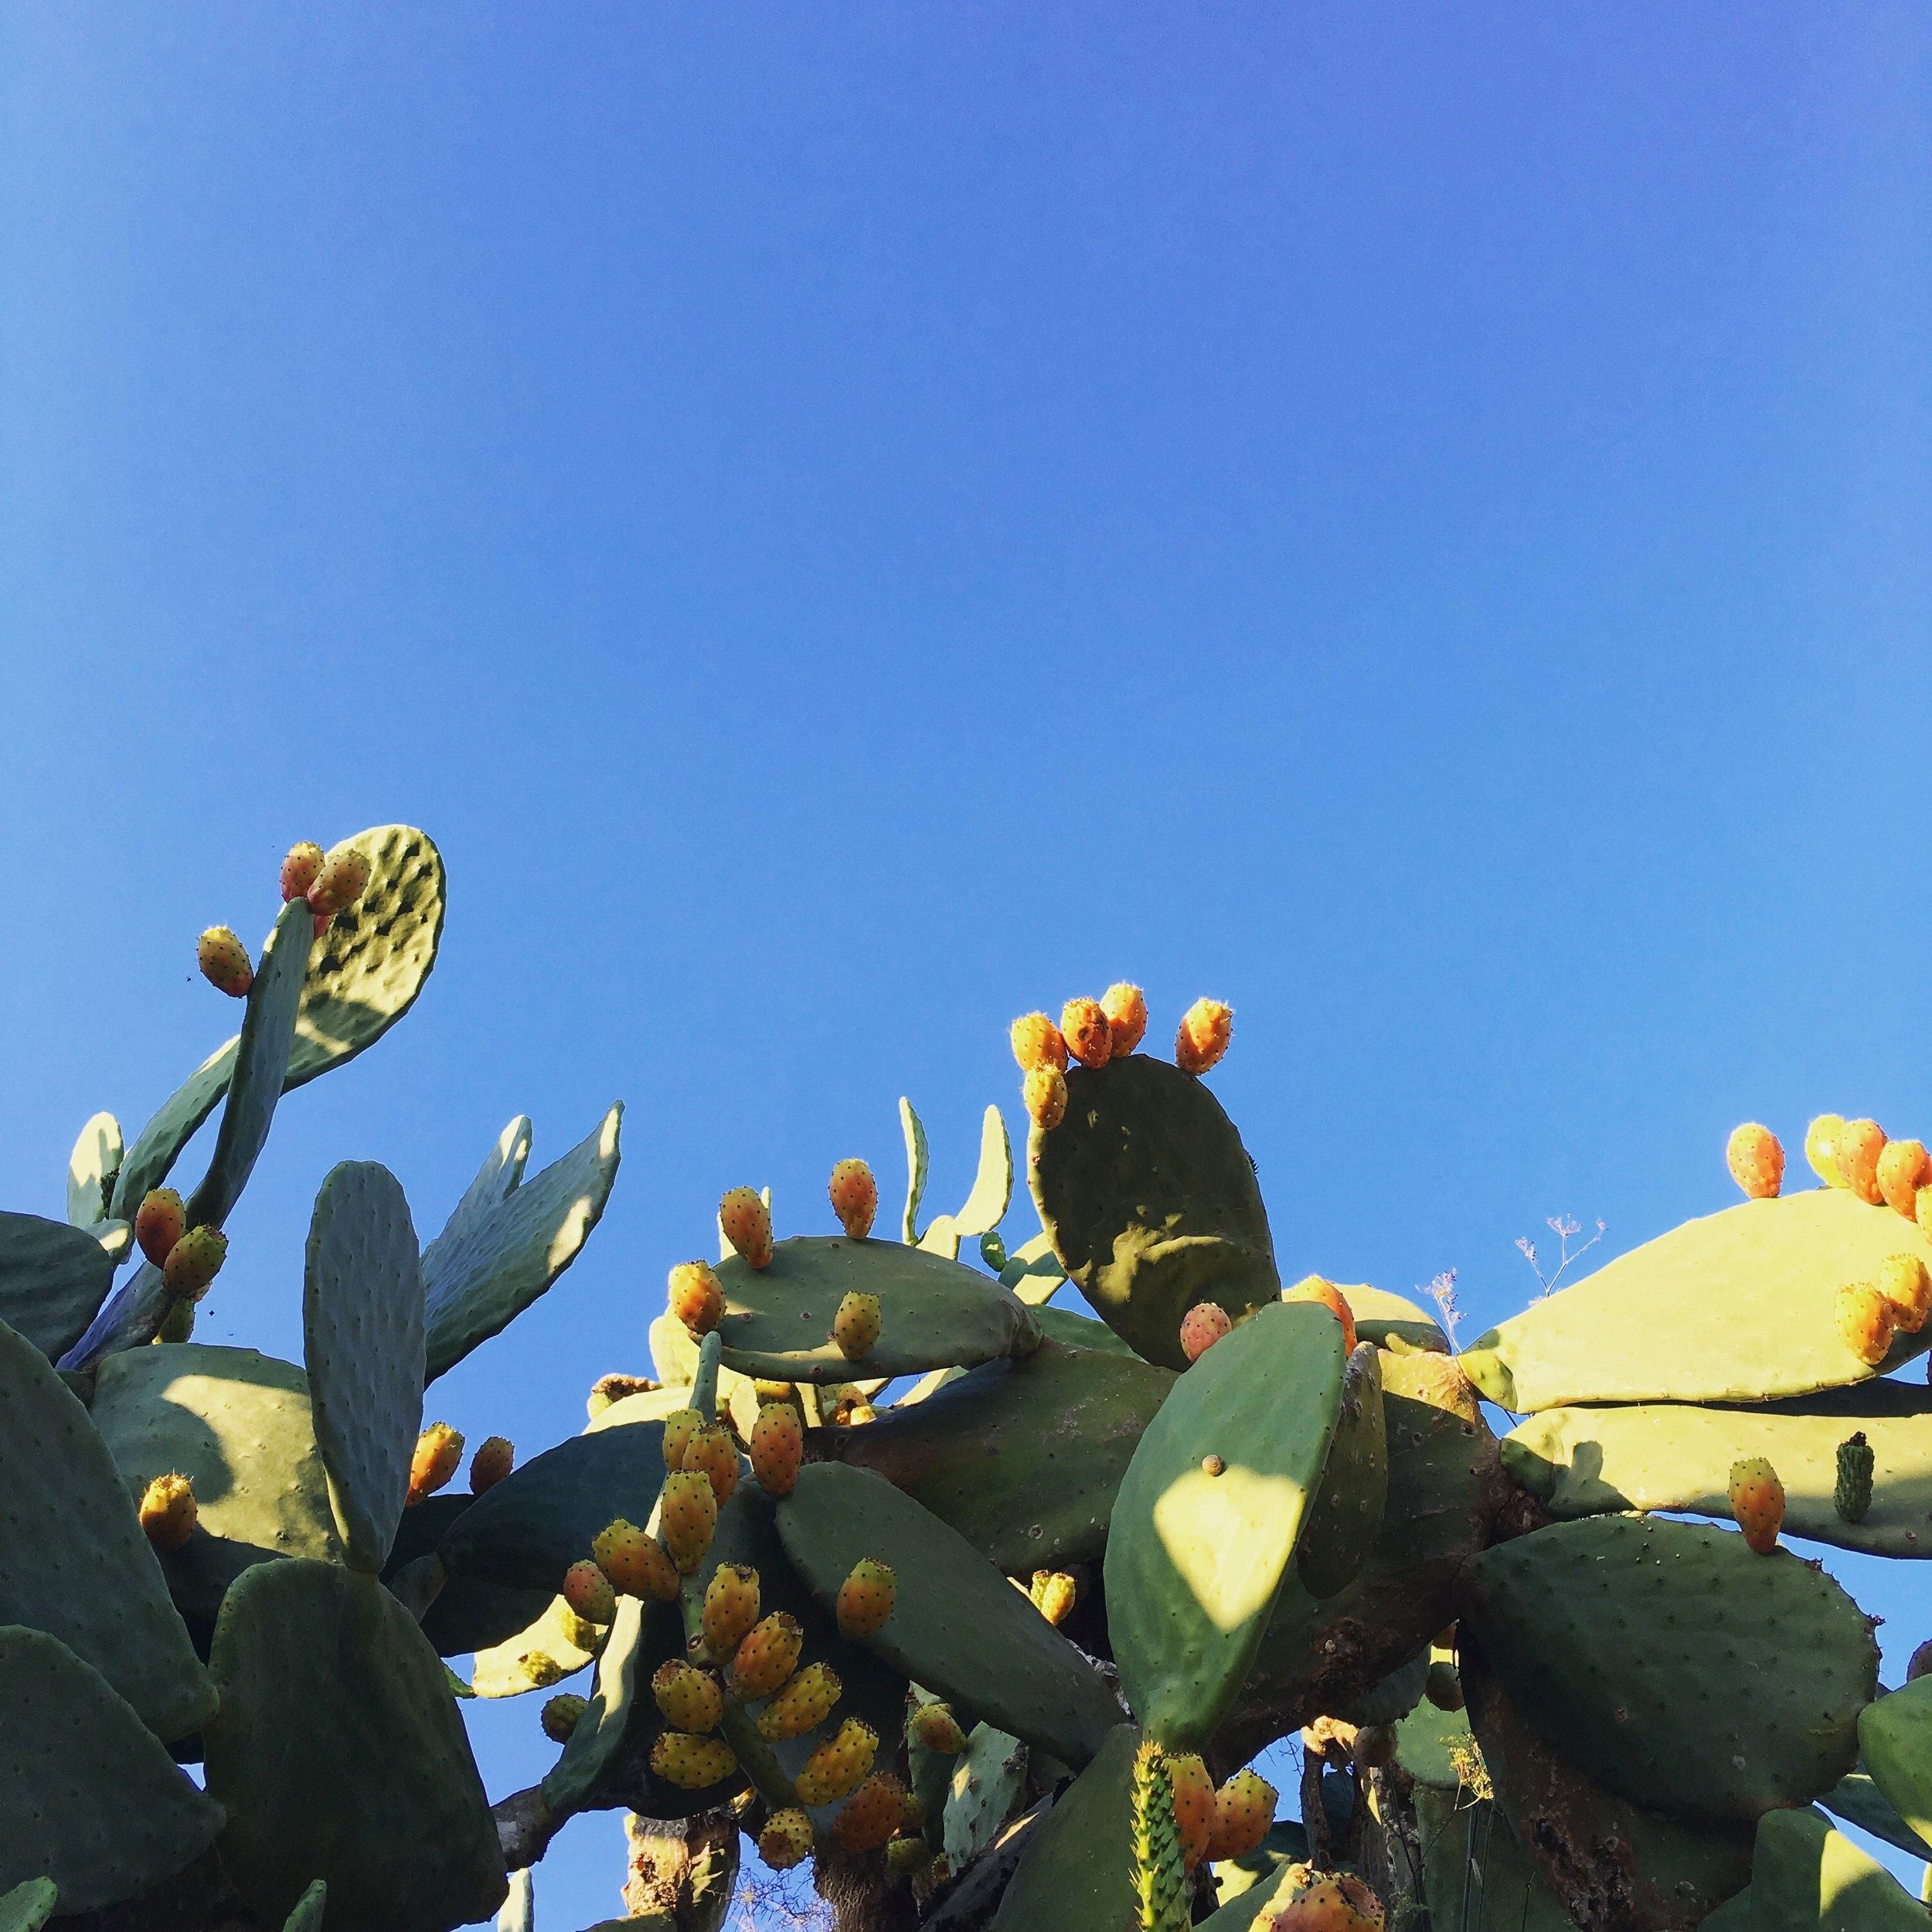 Lozidaze_Malta-Prickly-Pear_01